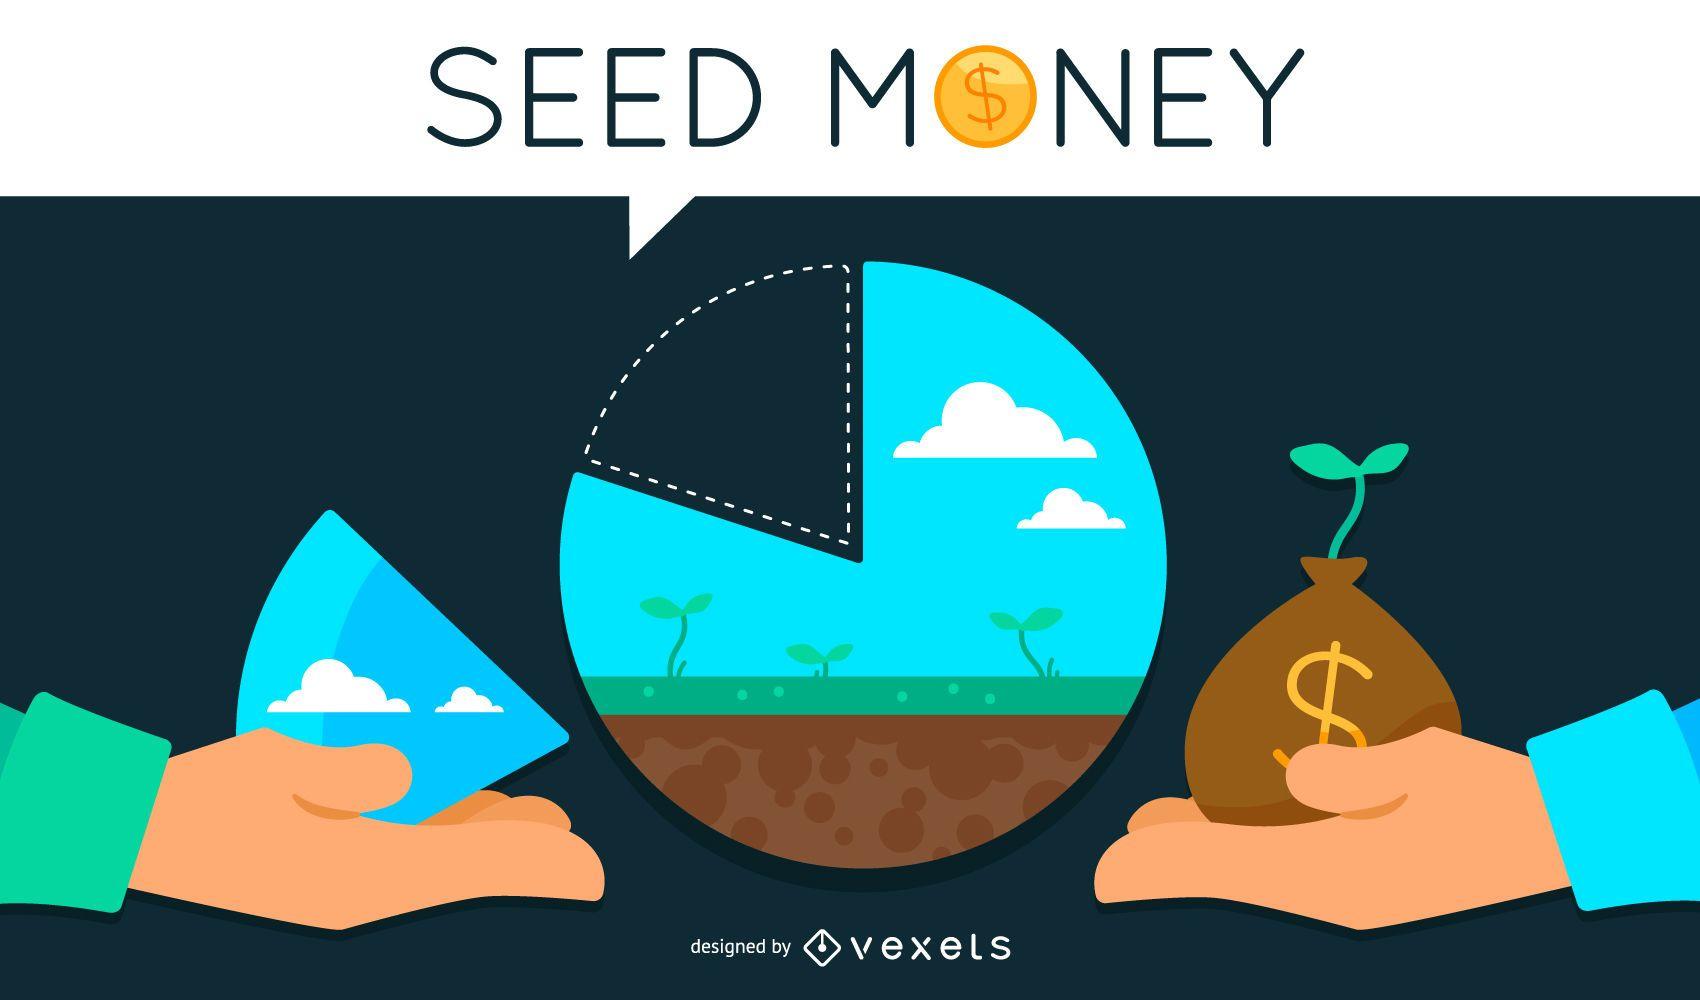 Seed Money concept illustration